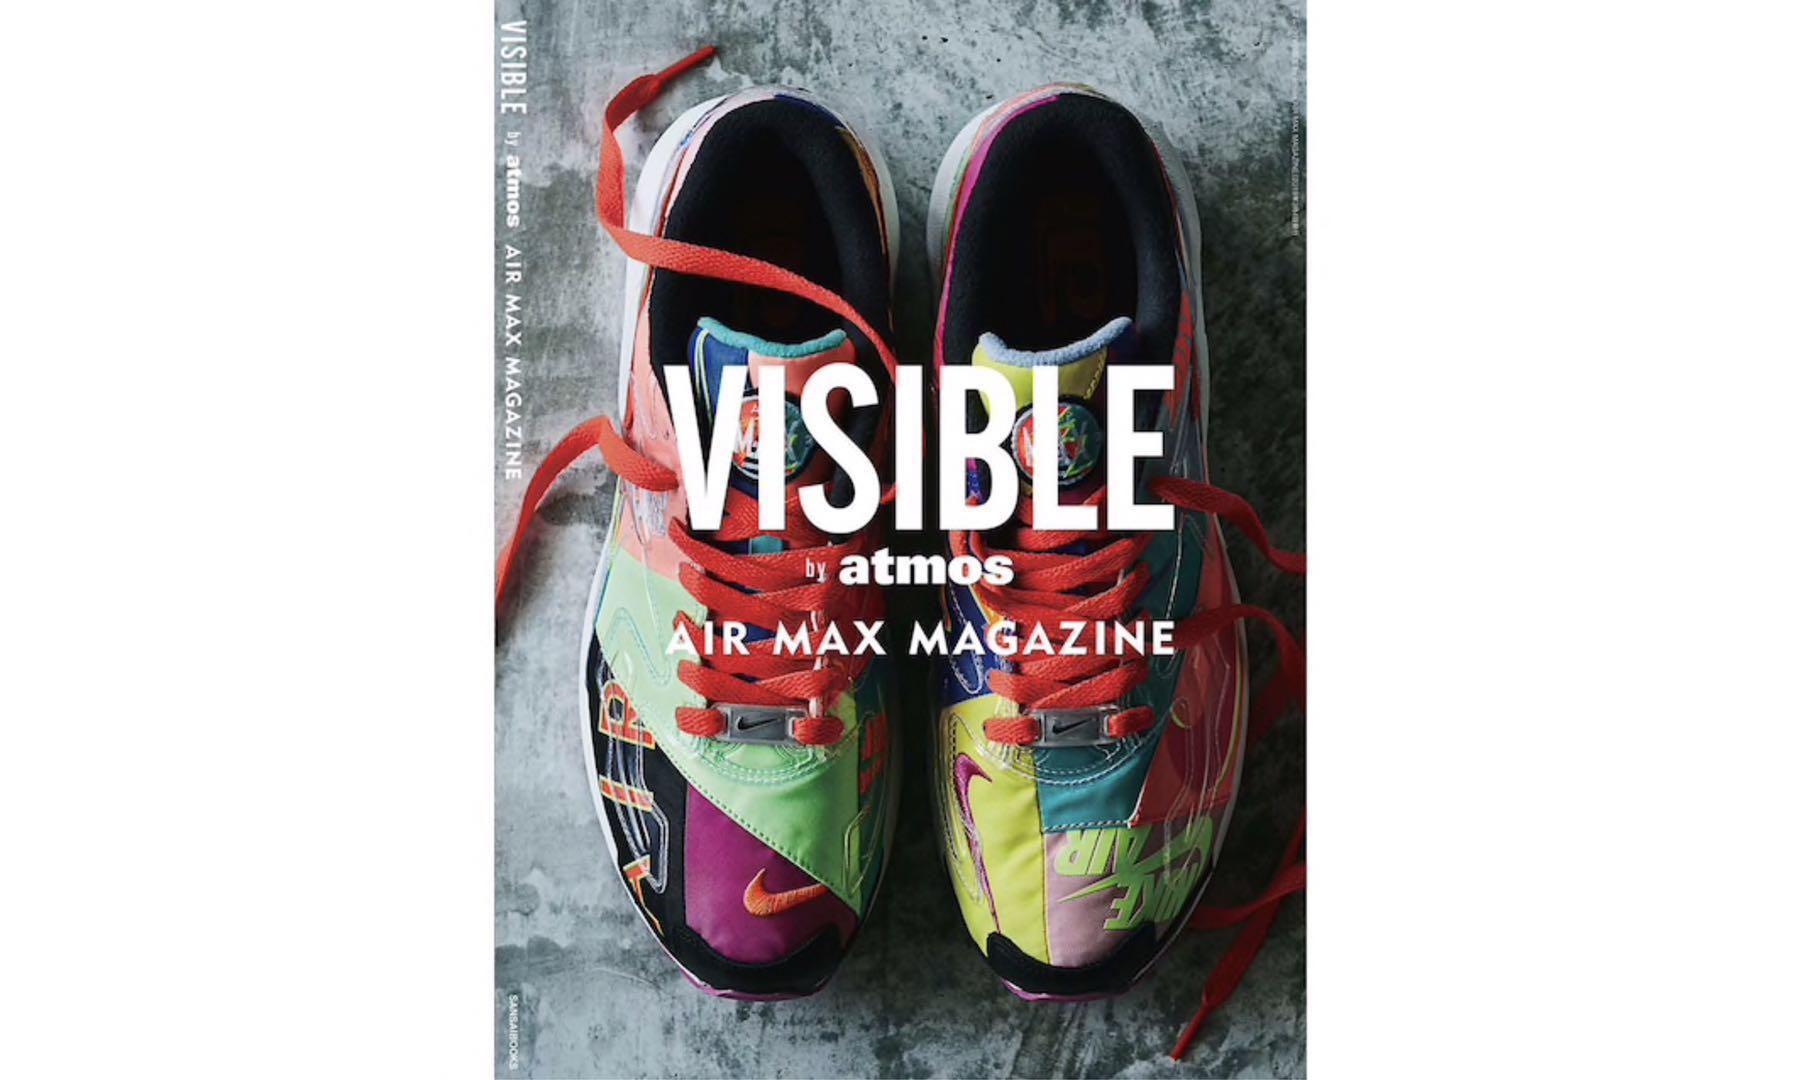 atmos 发布 Nike Air Max 专门杂志